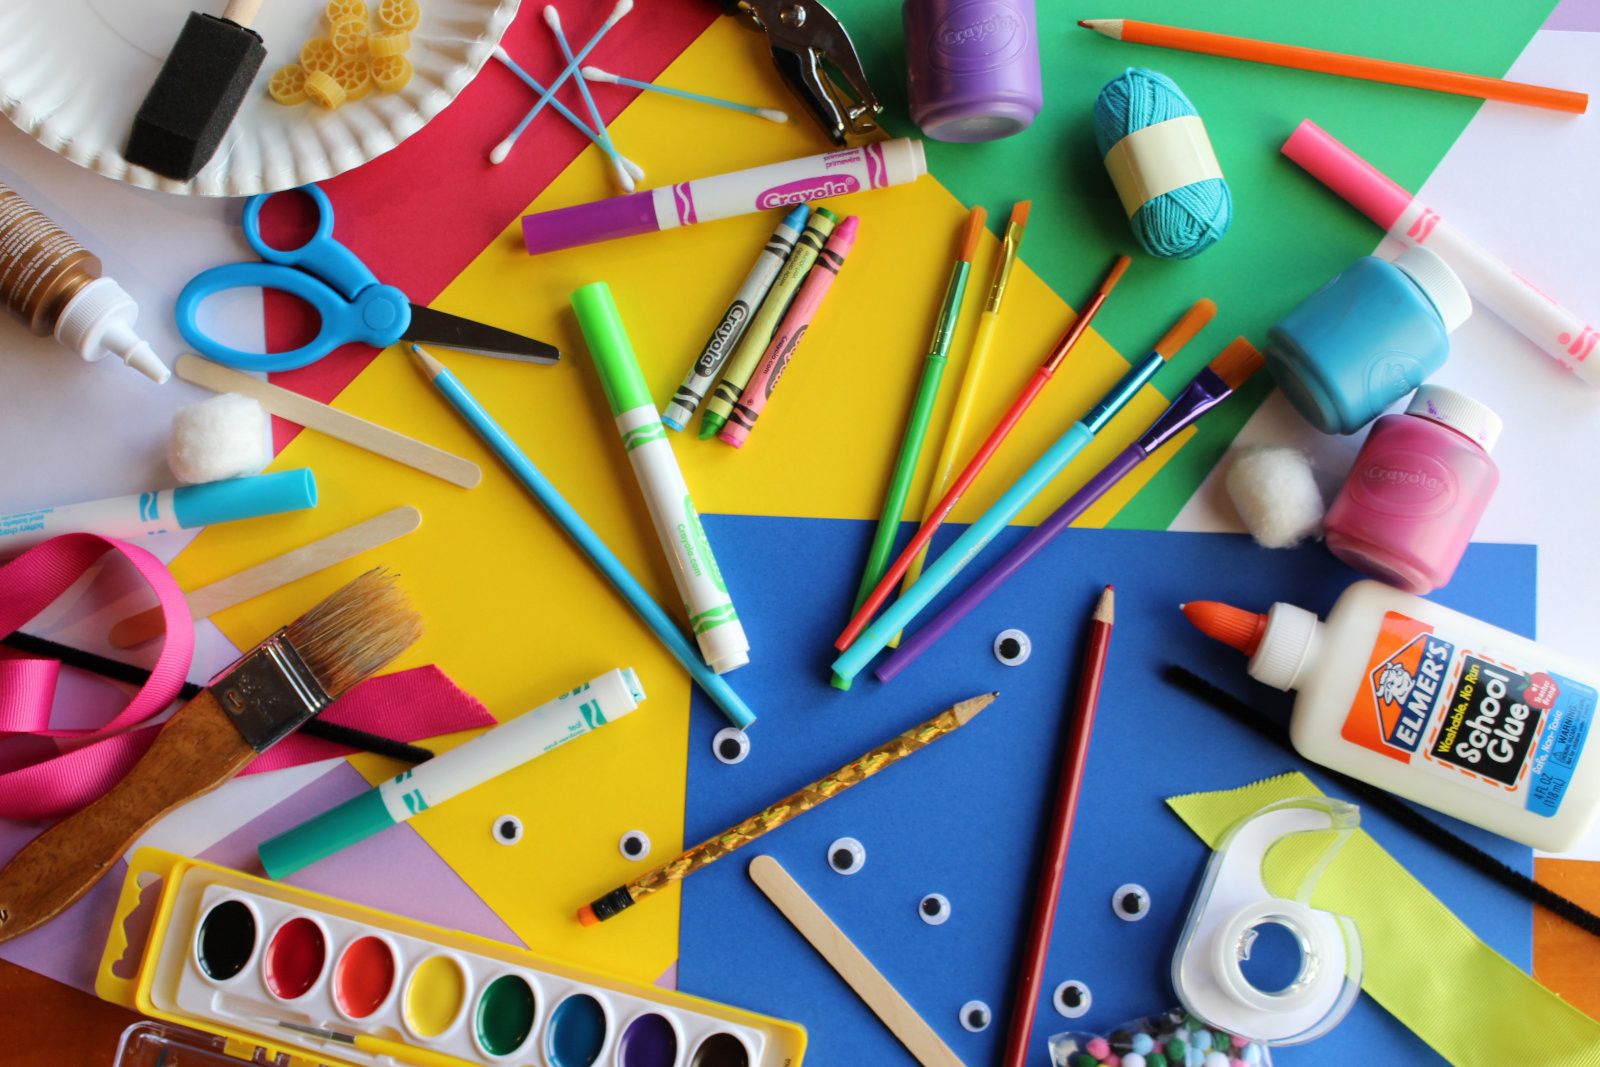 Kids Crafting Supplies  Best Crafts for Kids